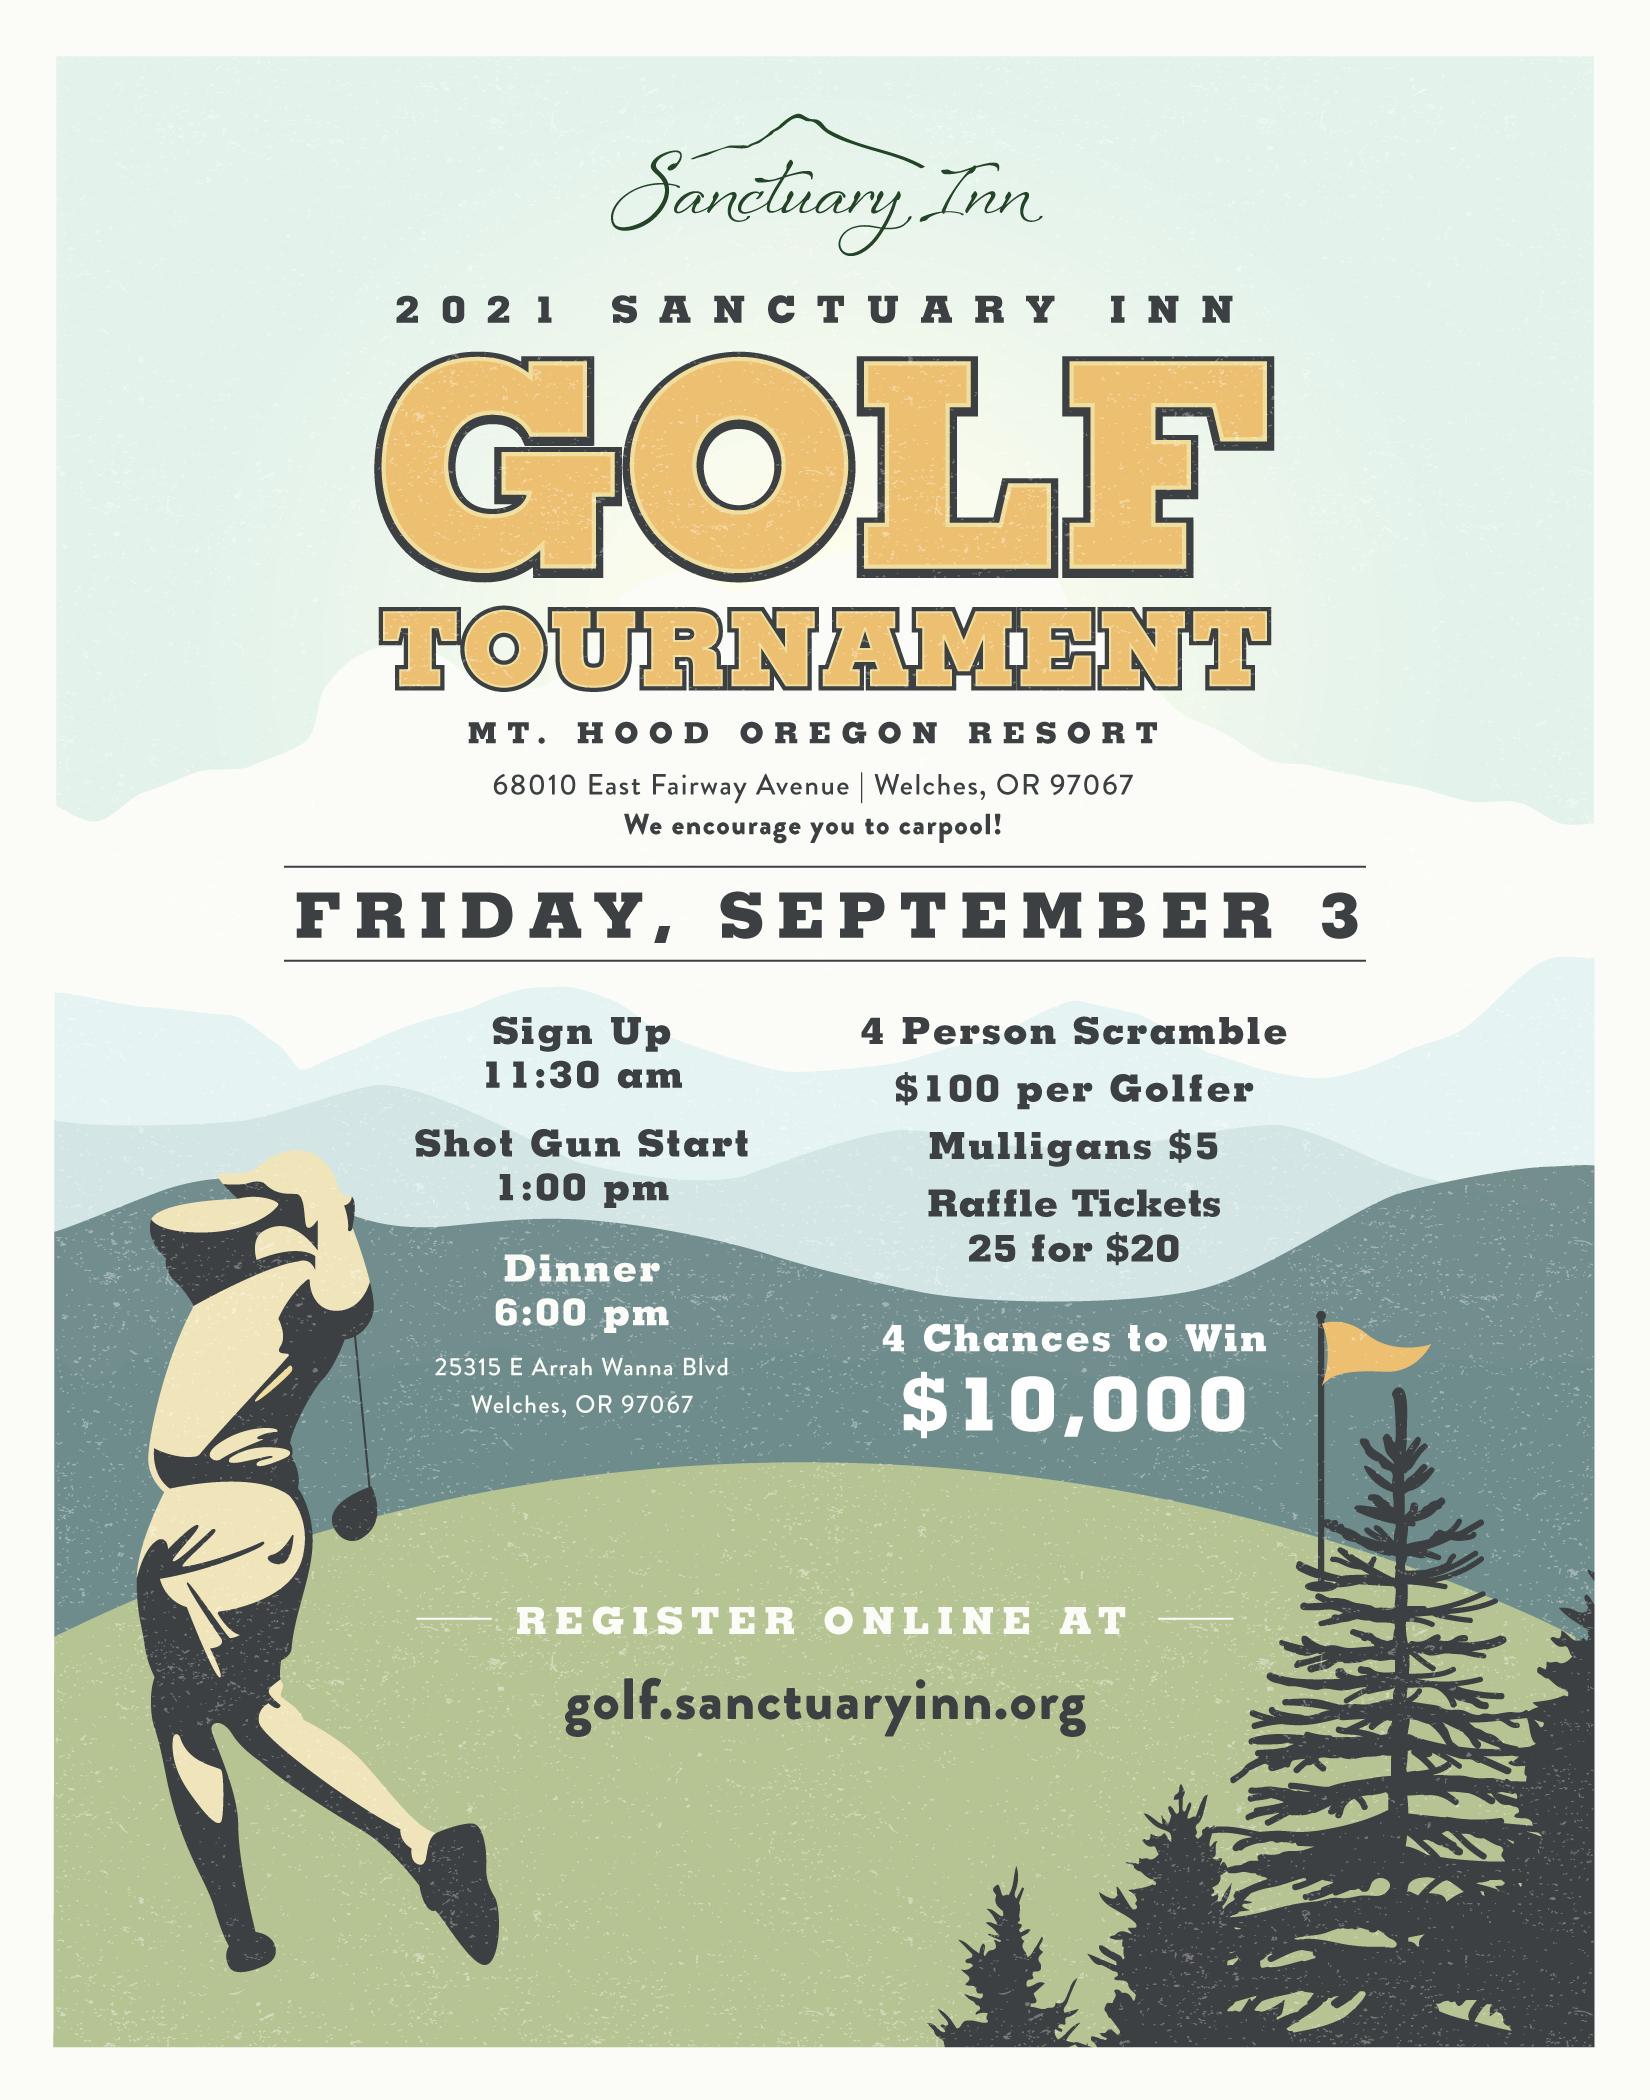 Sanctuary Inn Golf Tournament